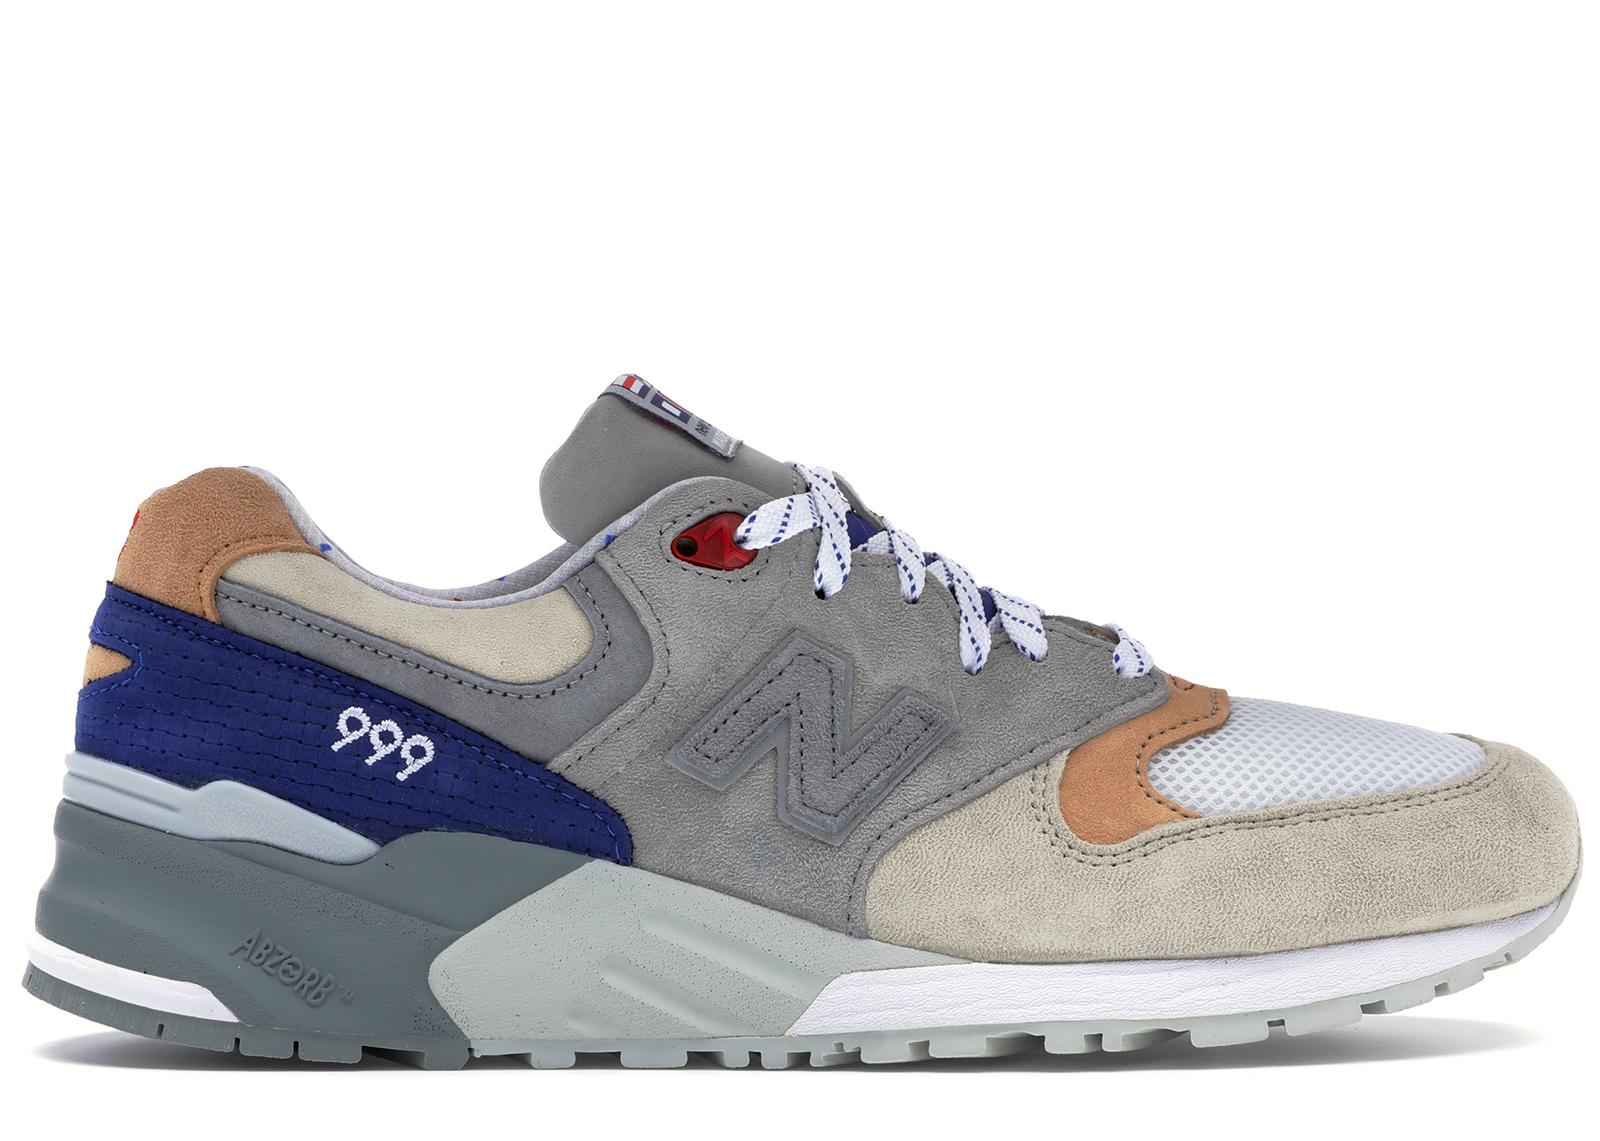 New Balance 999 Concepts Hyannis (Blue) - M999CP1